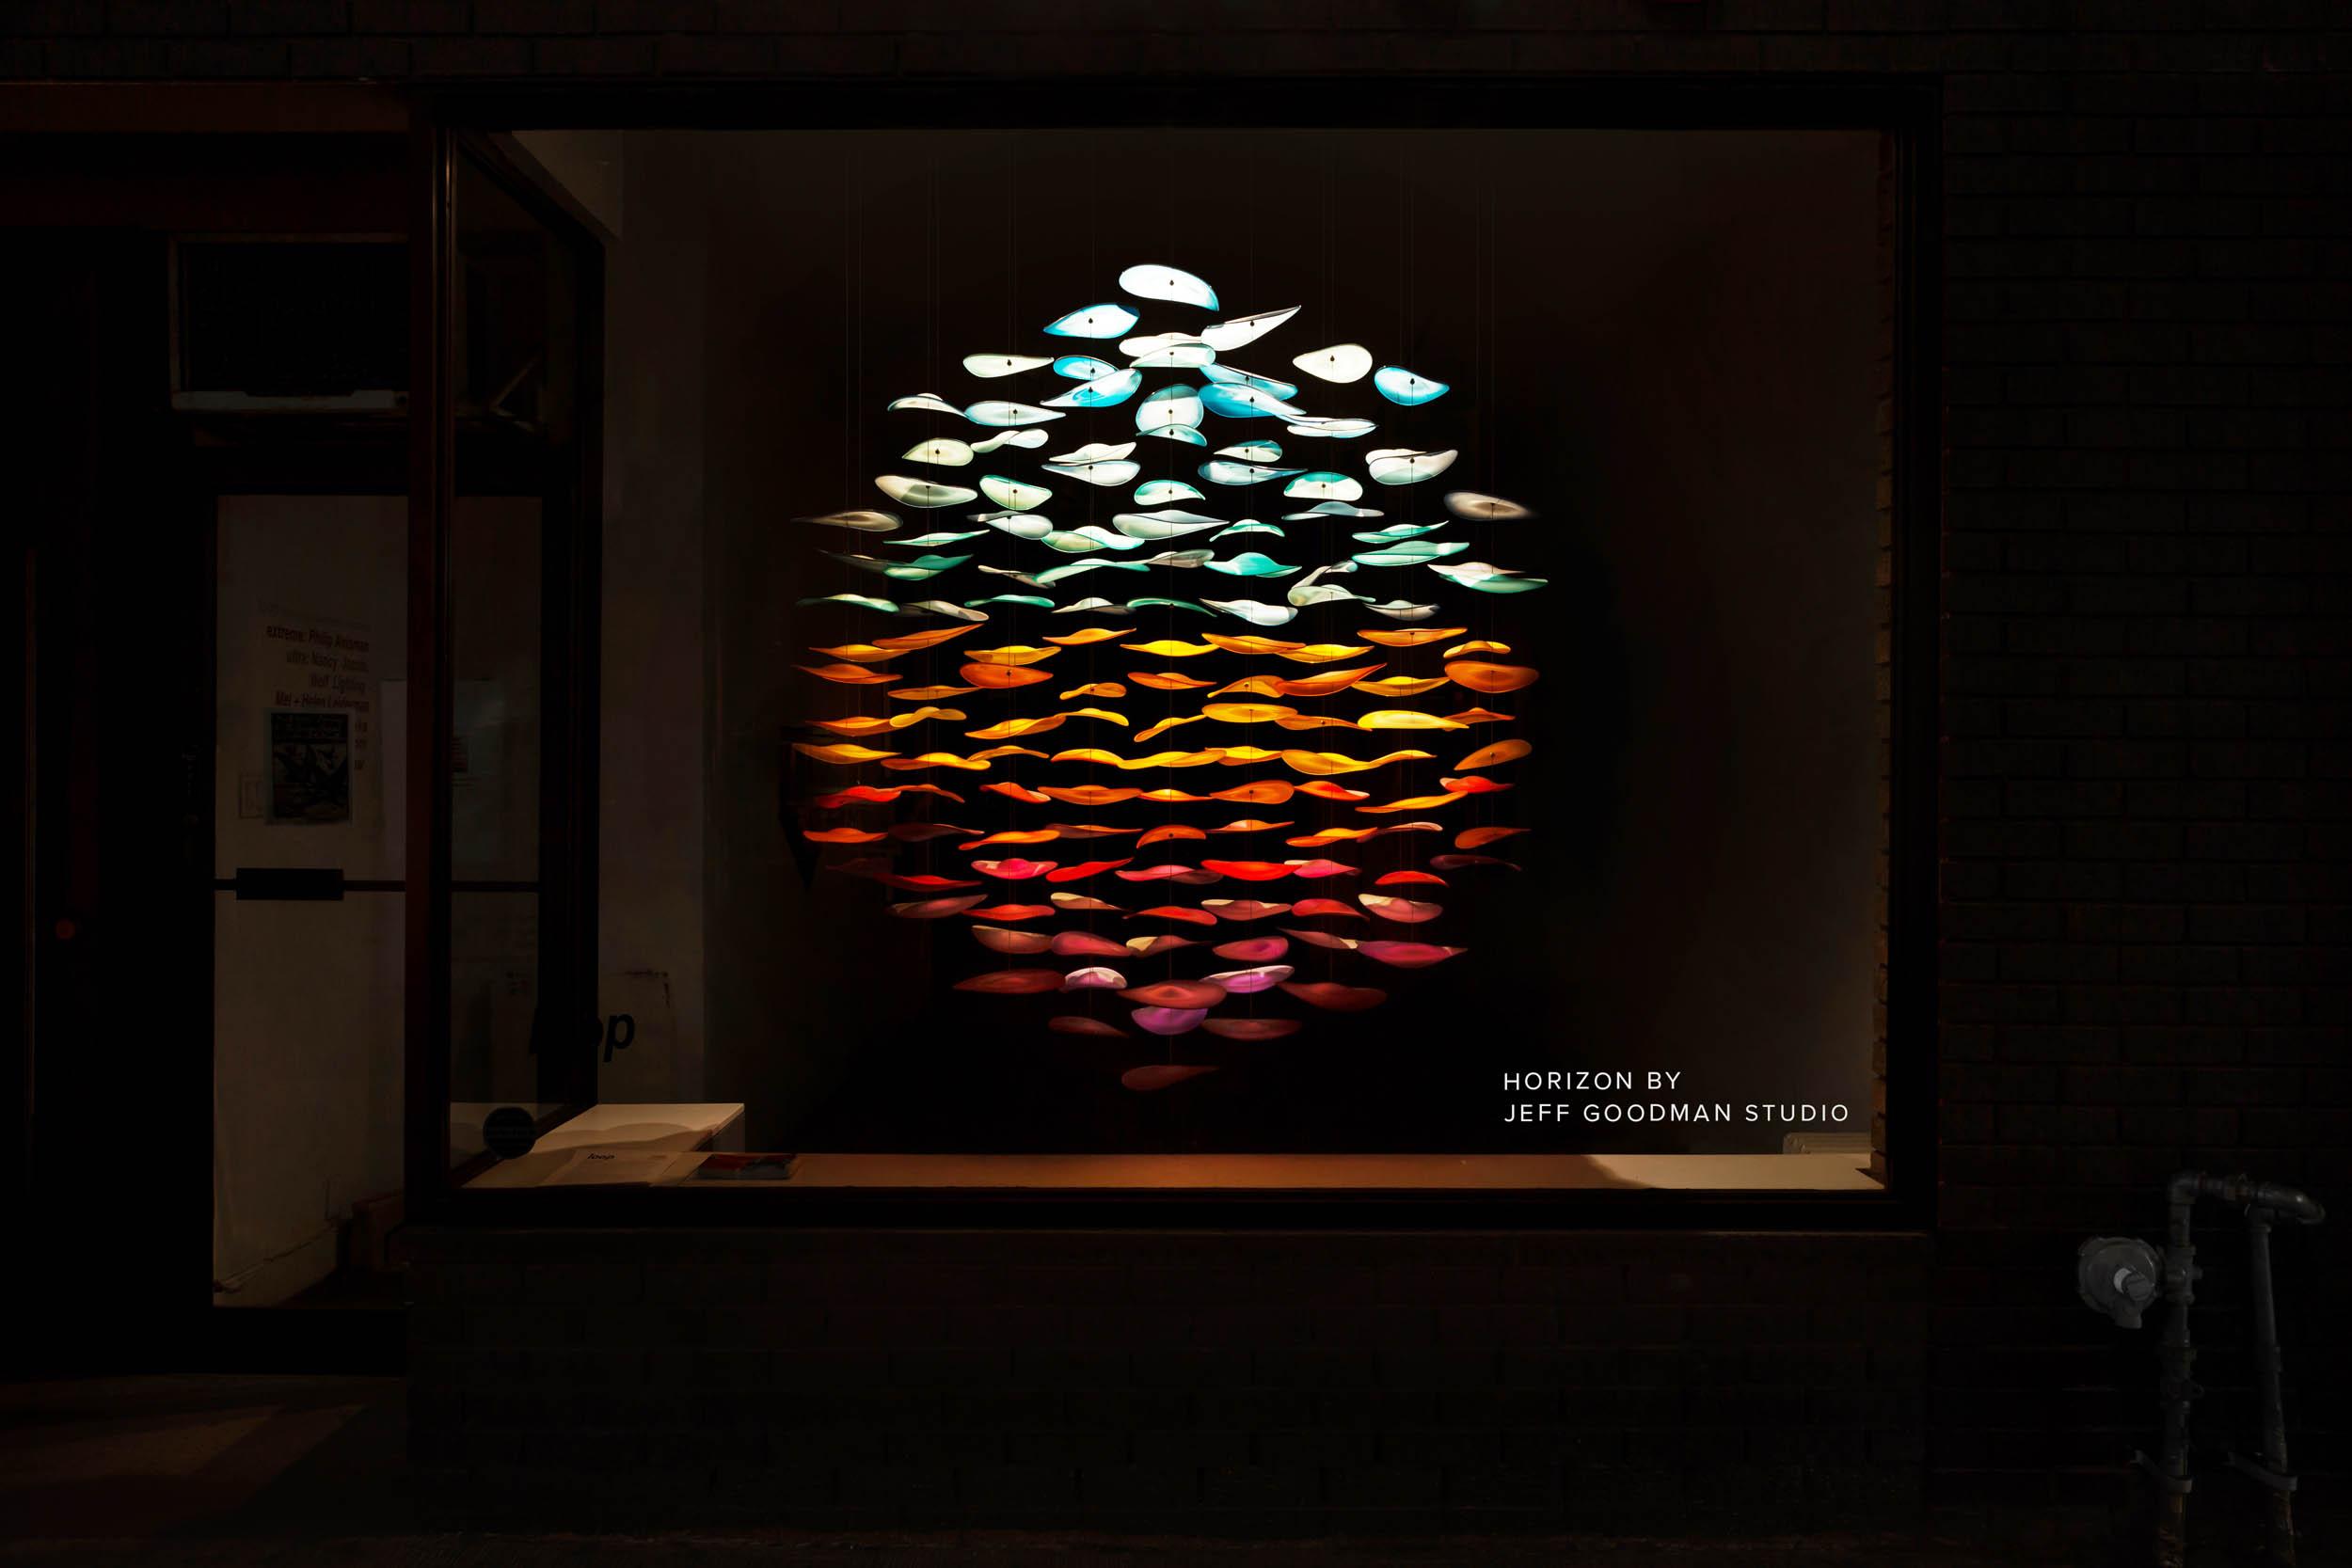 Horizon Blown Glass Art Installation by Jeff Goodman Studio